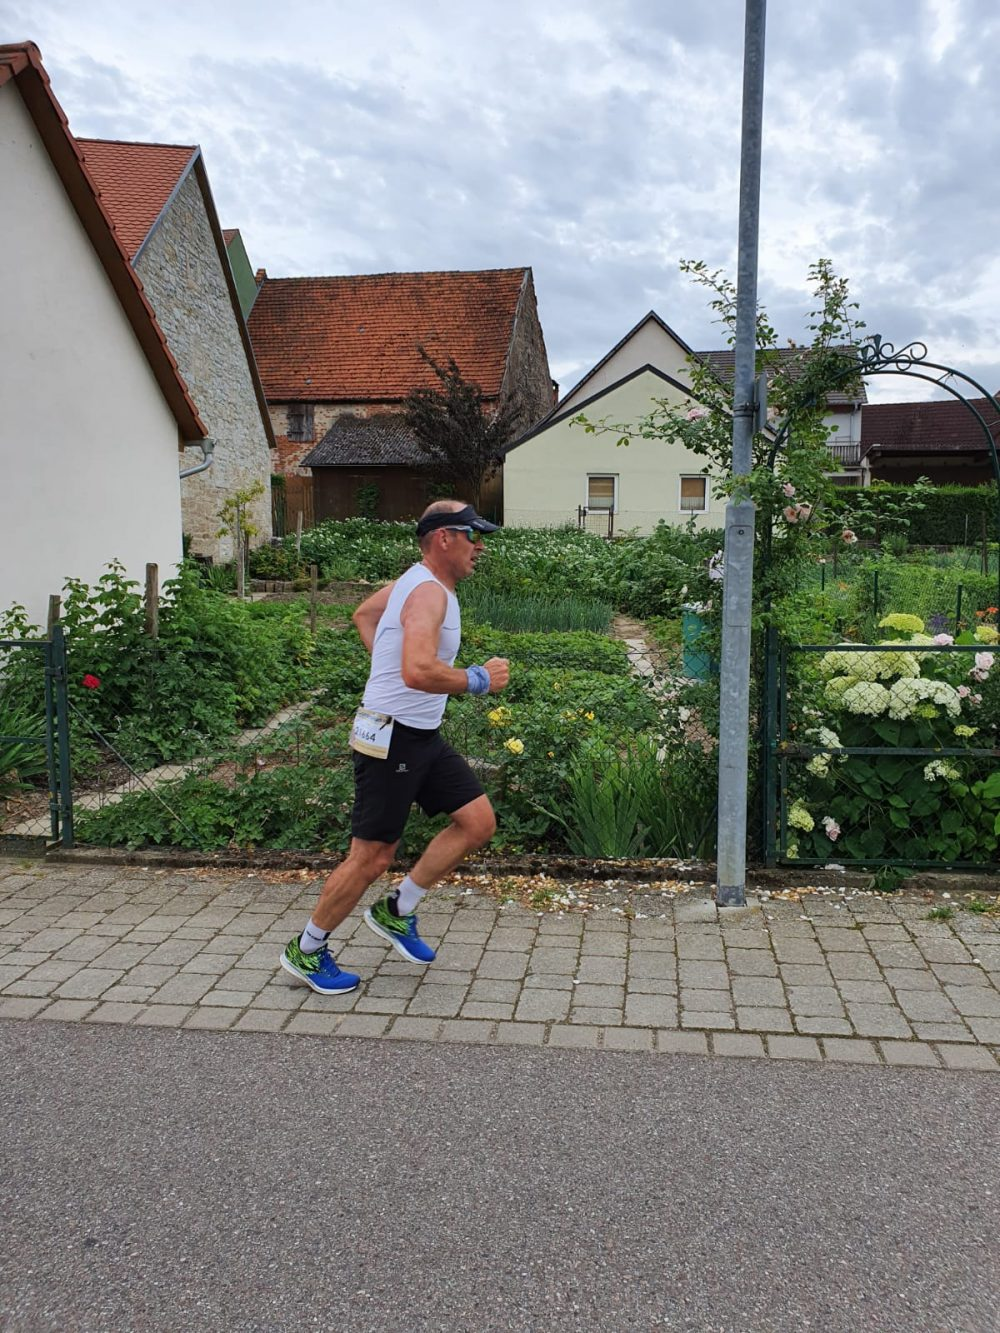 Strecke Tauberrettersheim